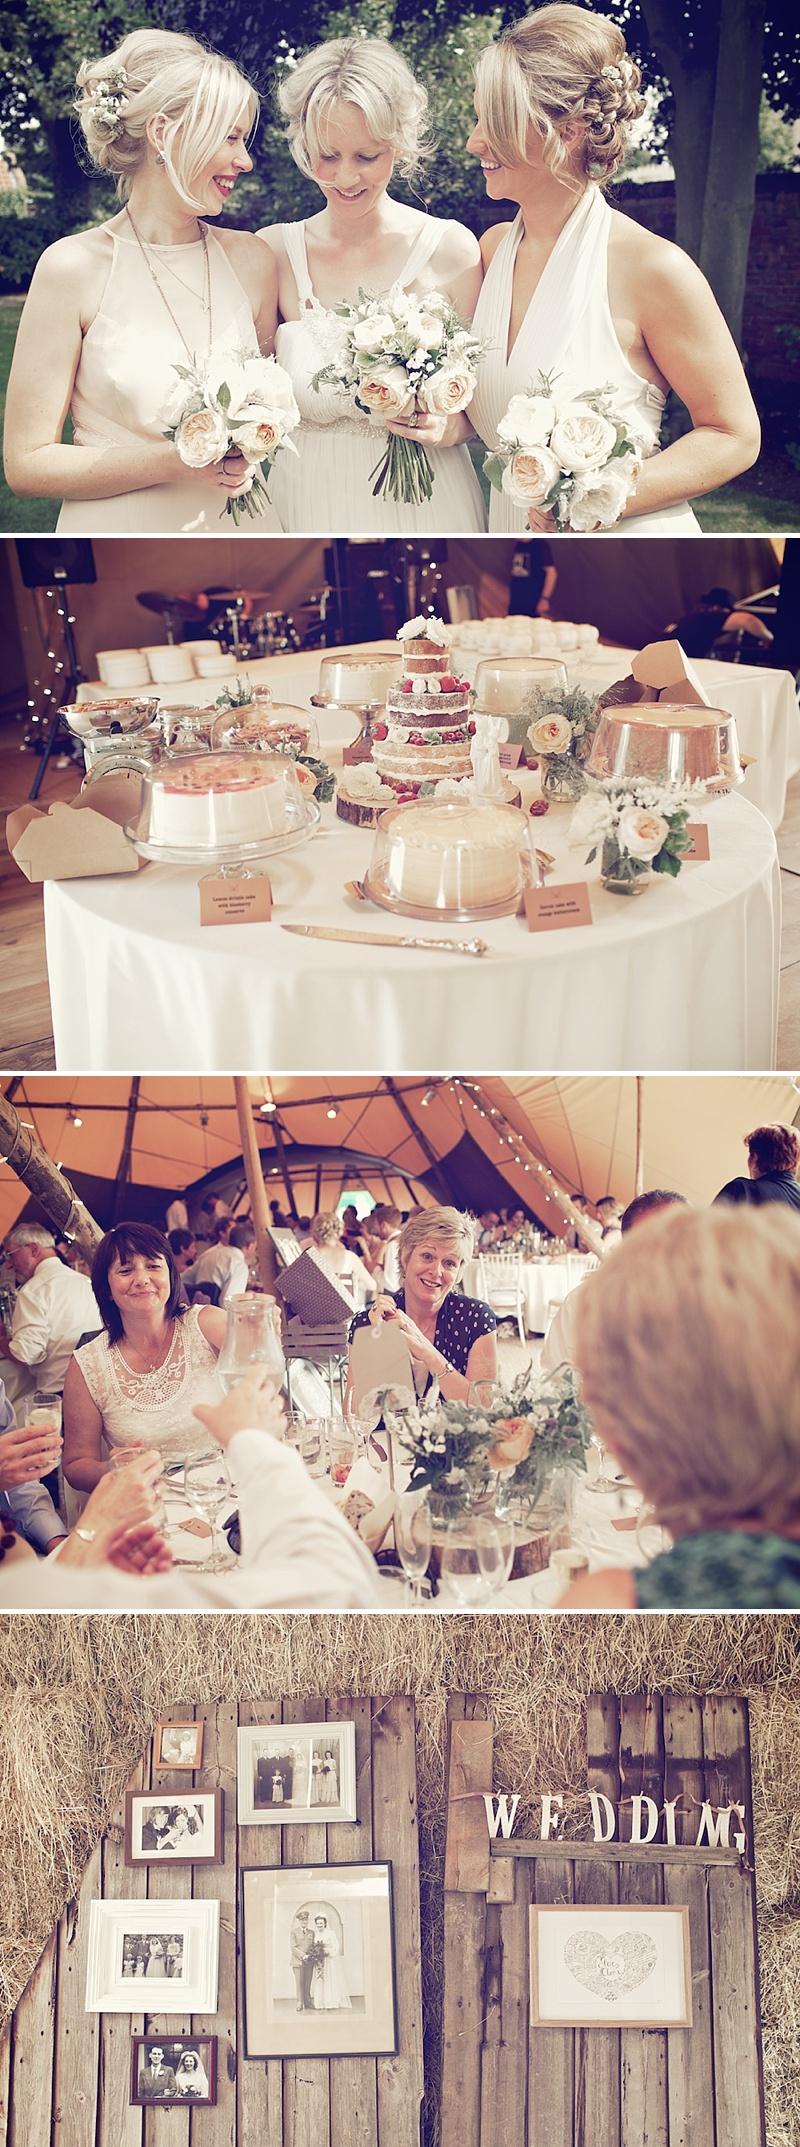 An english country backgarden humanist wedding with Biba dress tipi reception_0012